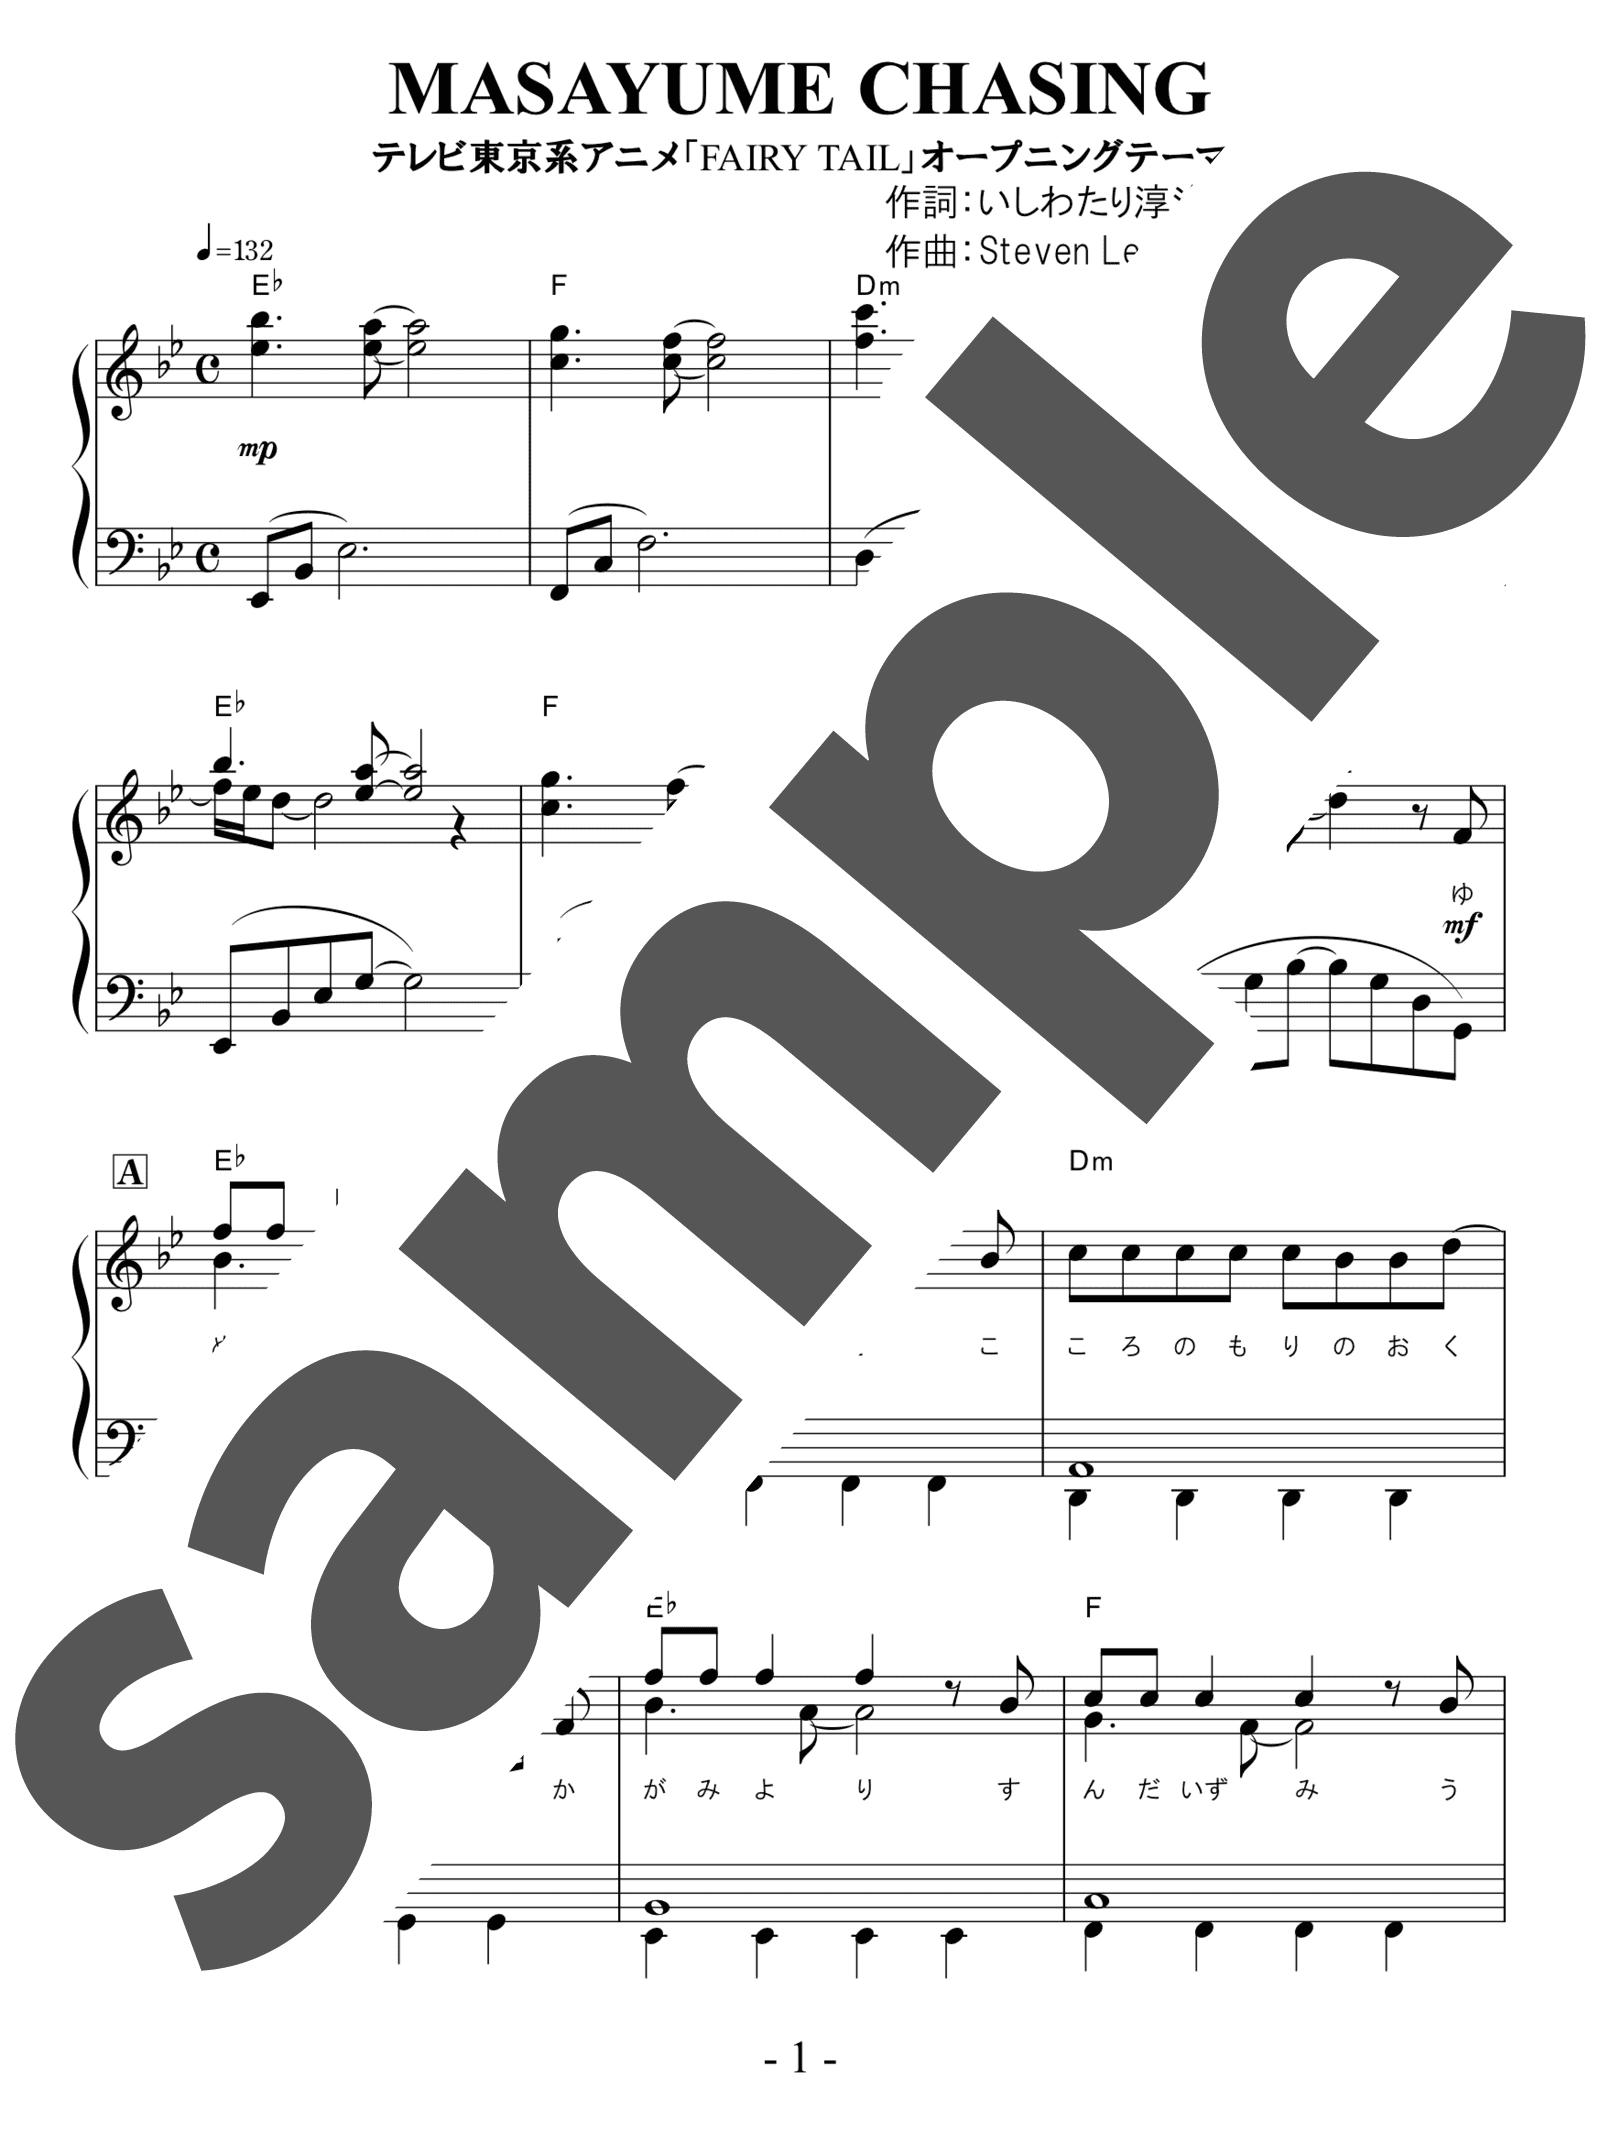 「MASAYUME CHASING」のサンプル楽譜